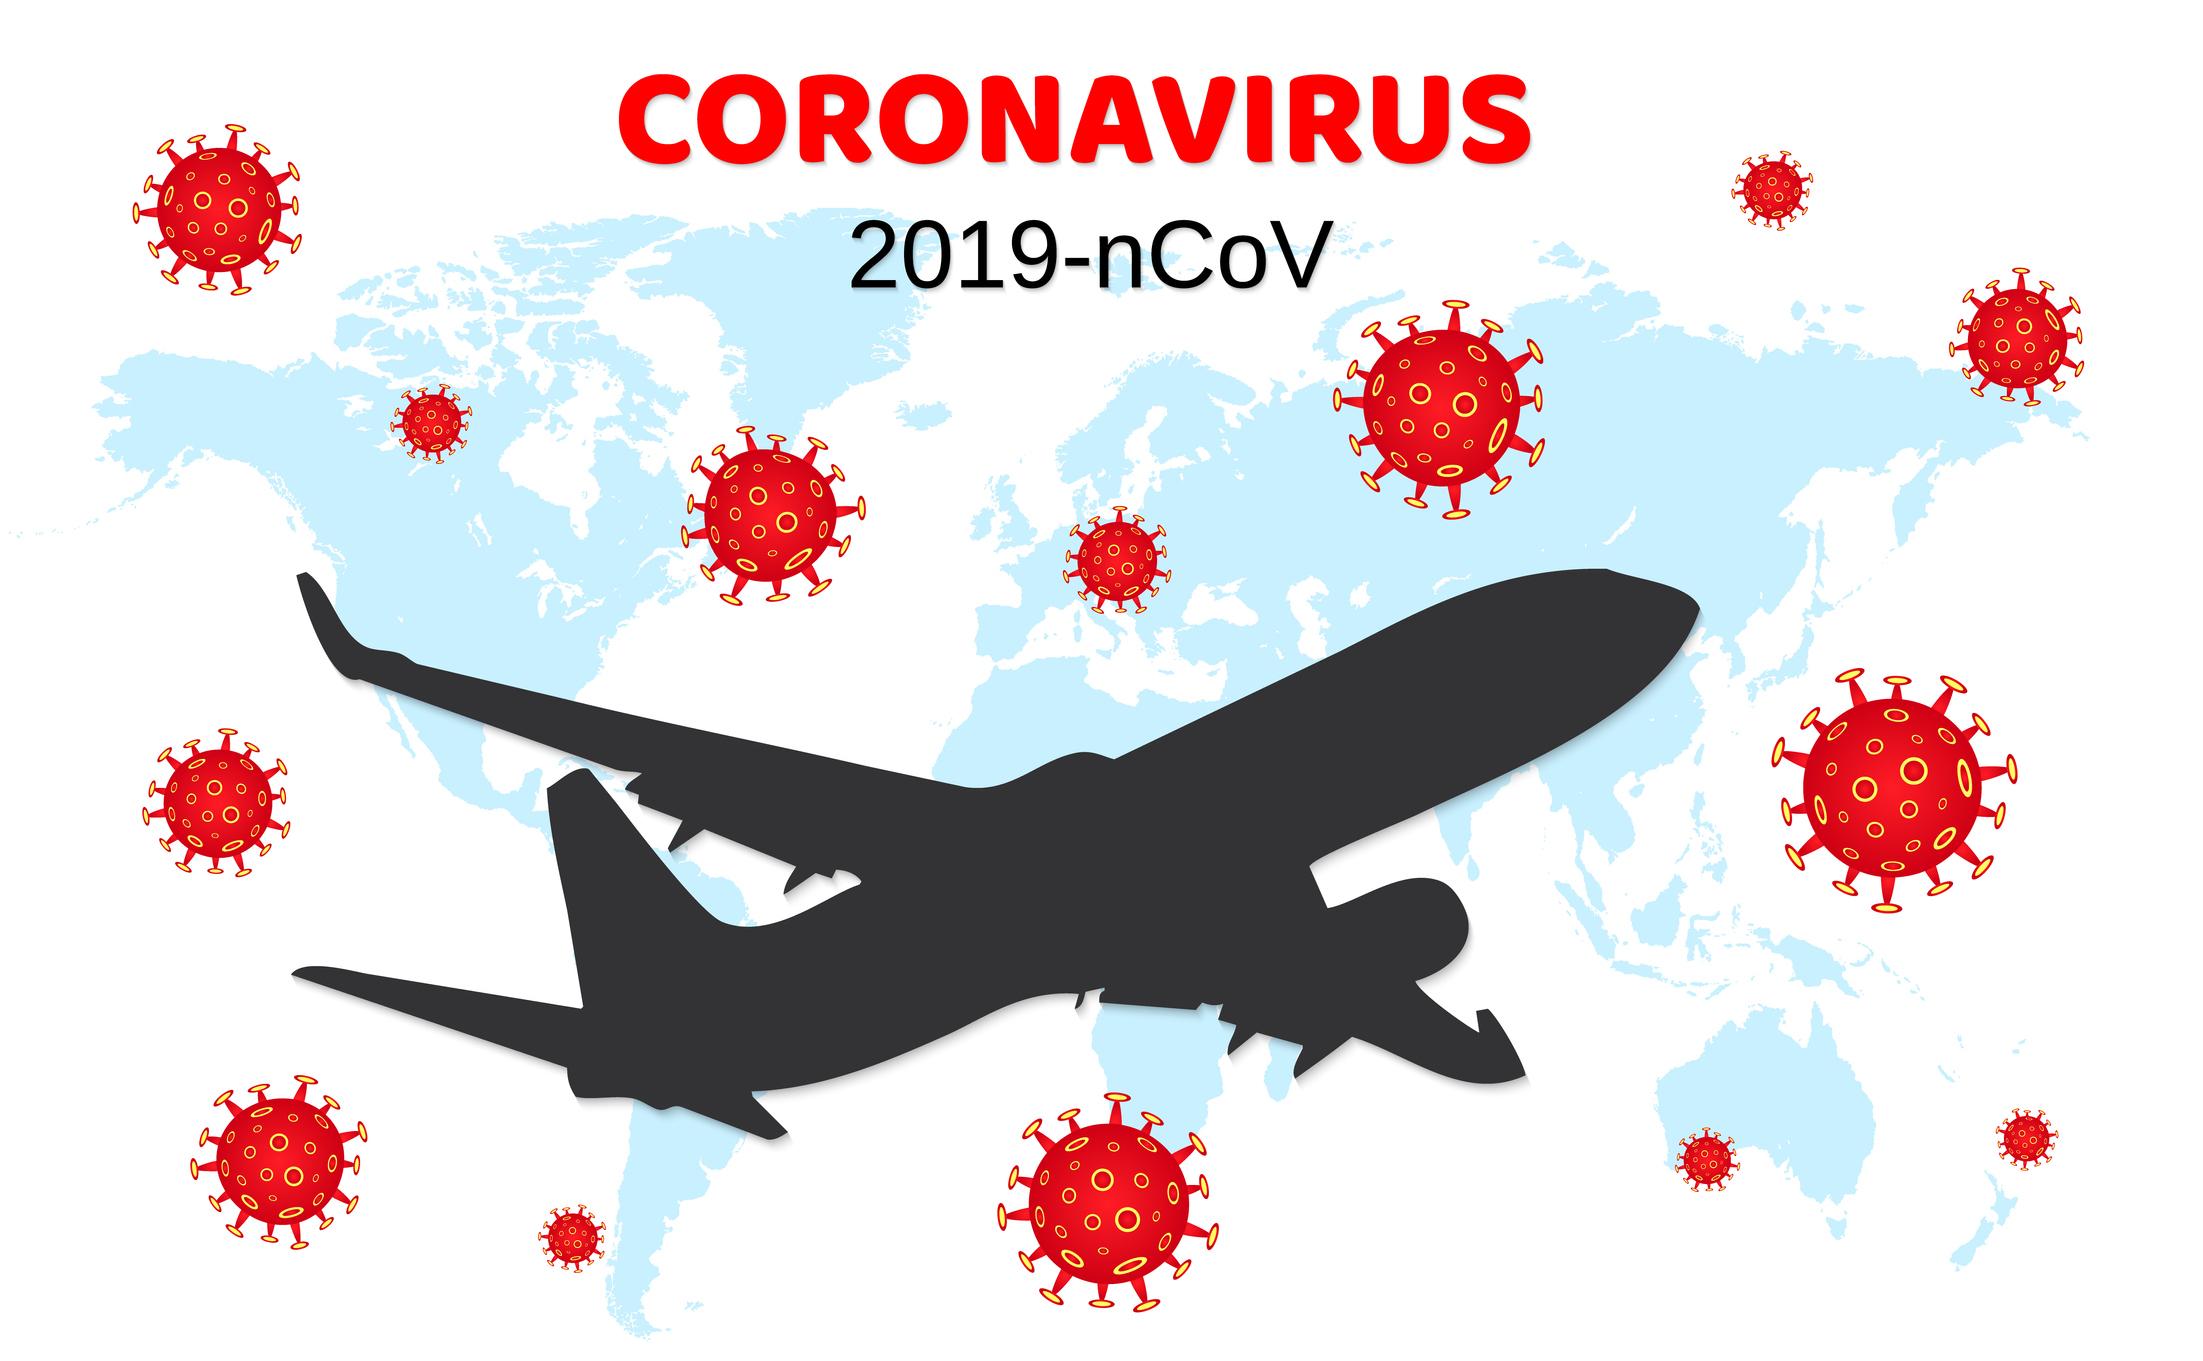 Air Travel Cancellations Up 21% on Coronavirus Fears | The Motley Fool